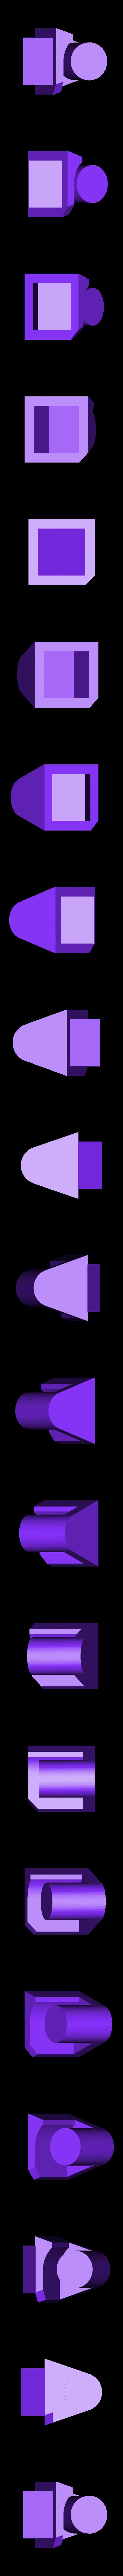 Elbow_Upper_R.STL Download STL file Low Poly Optimus Prime • Model to 3D print, biglildesign